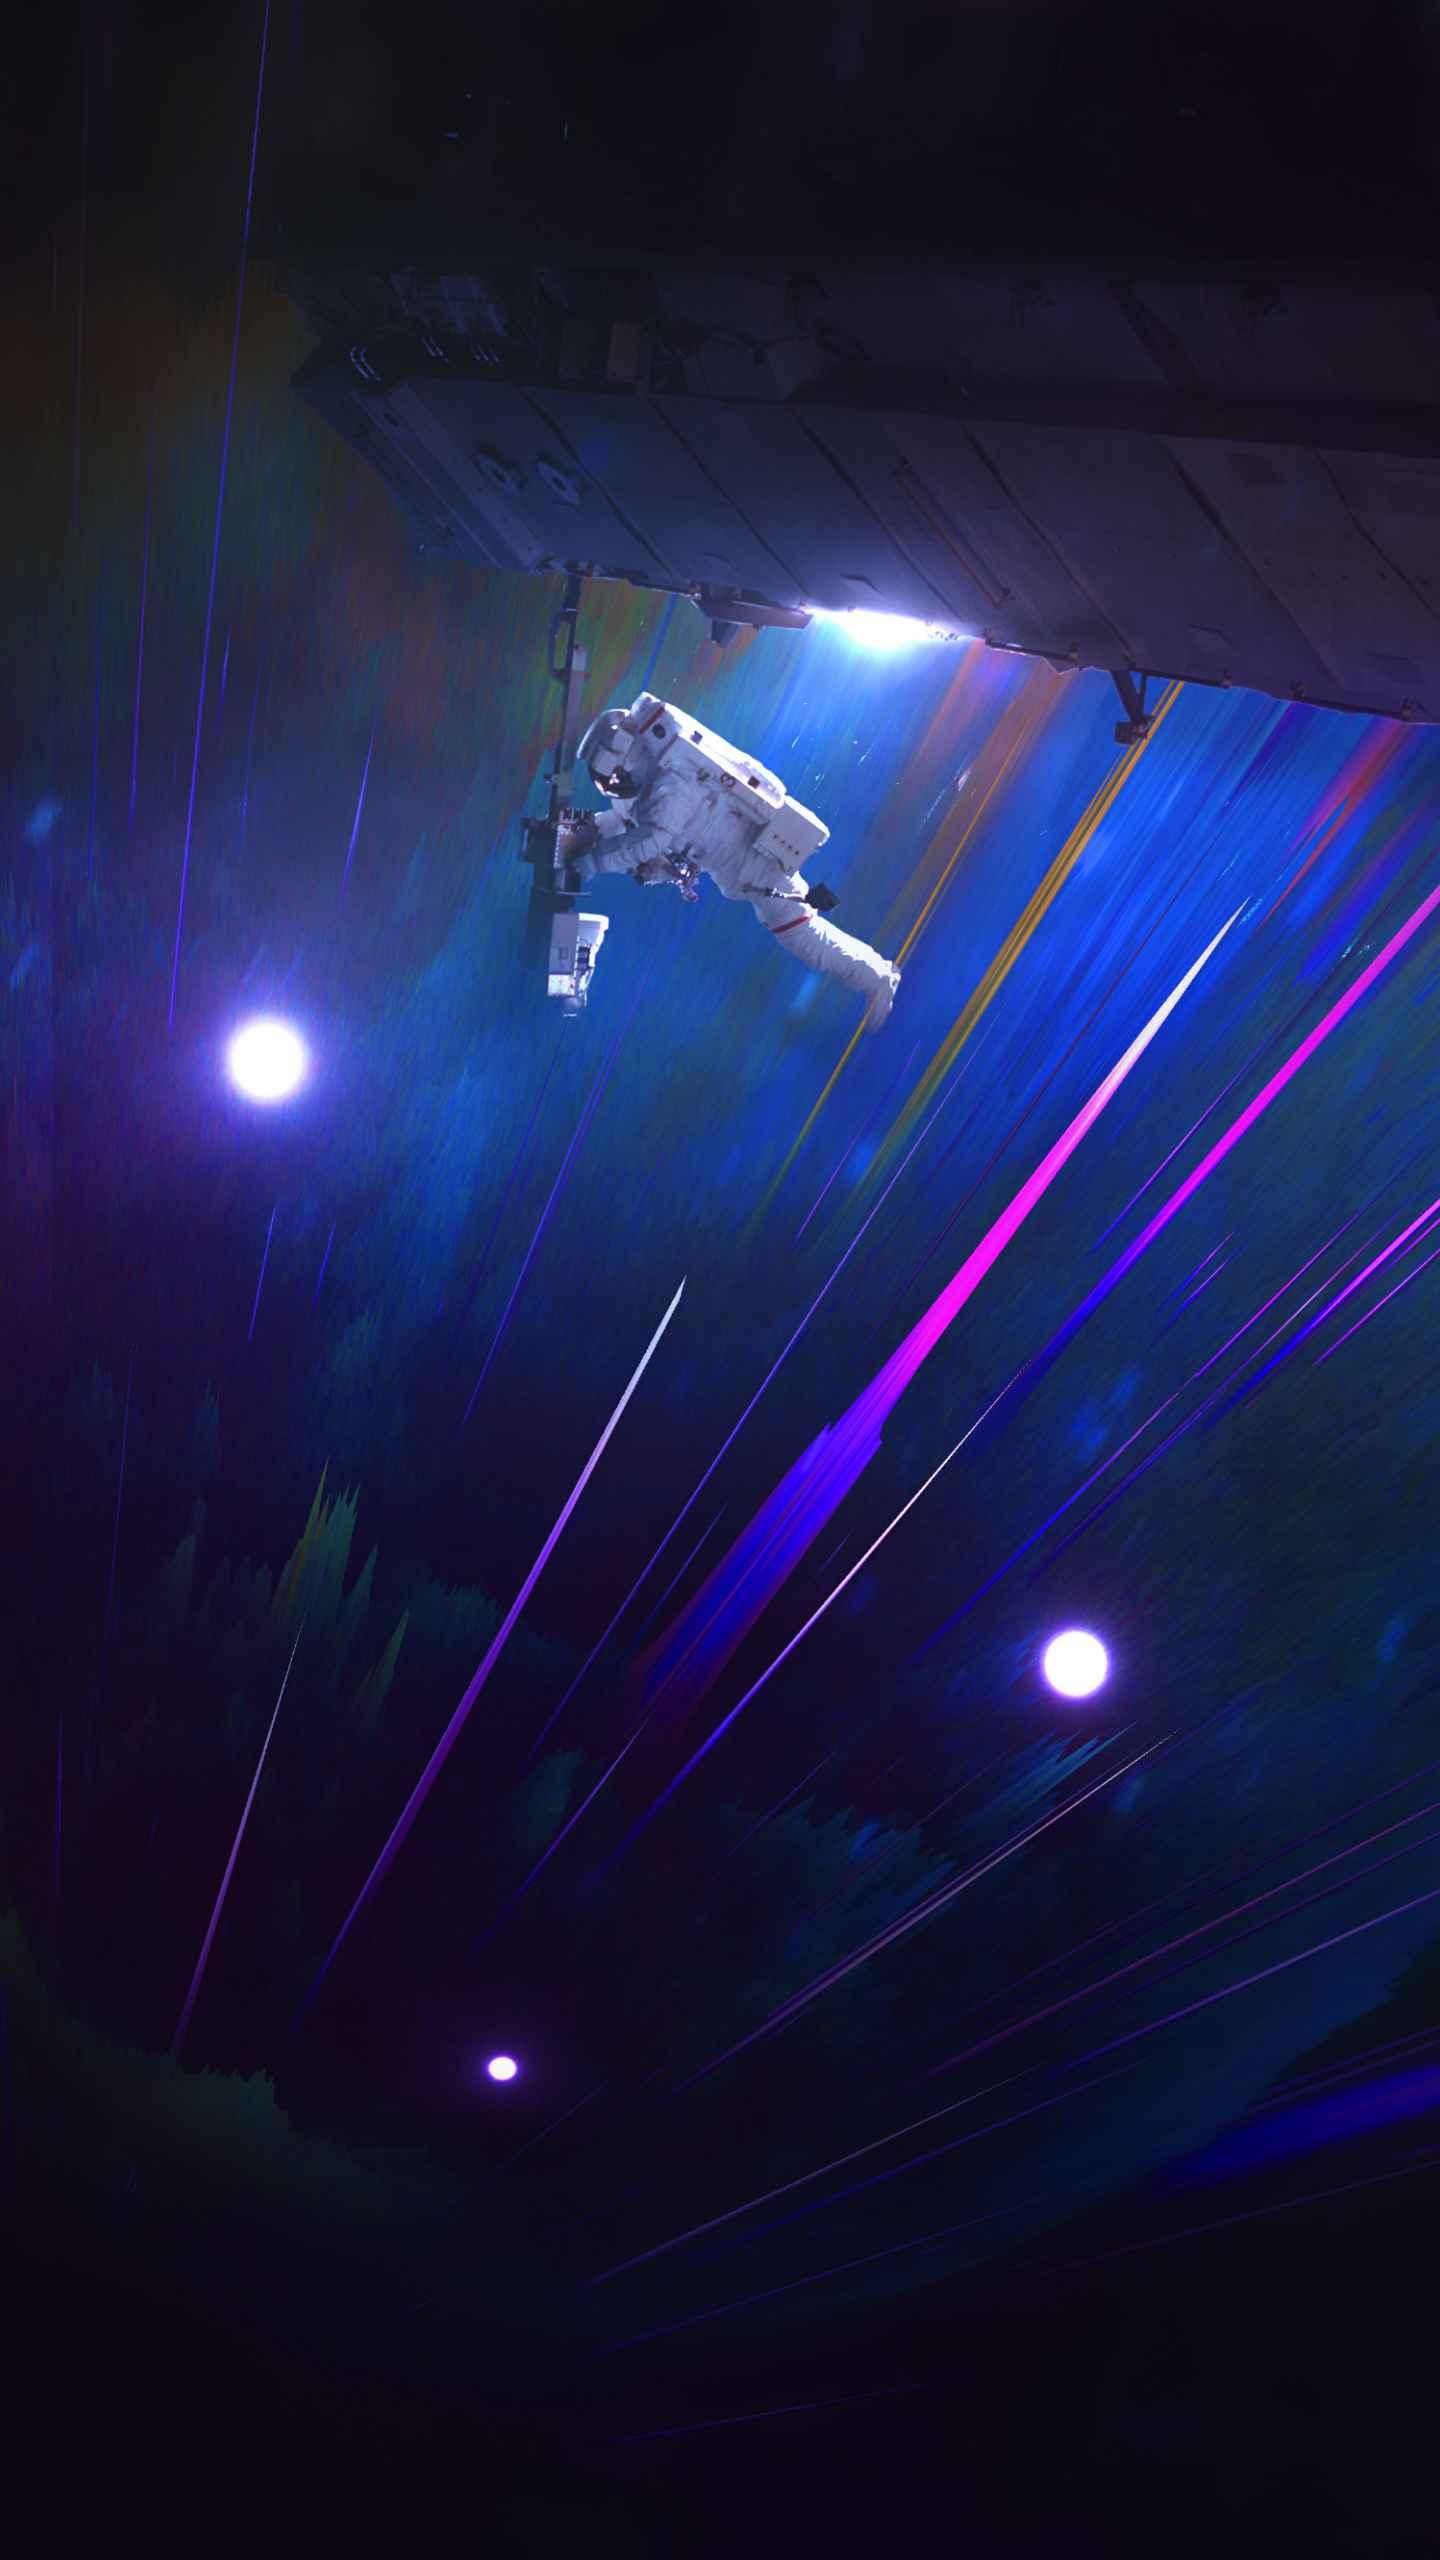 Astronaut Space Explorer iPhone Wallpaper